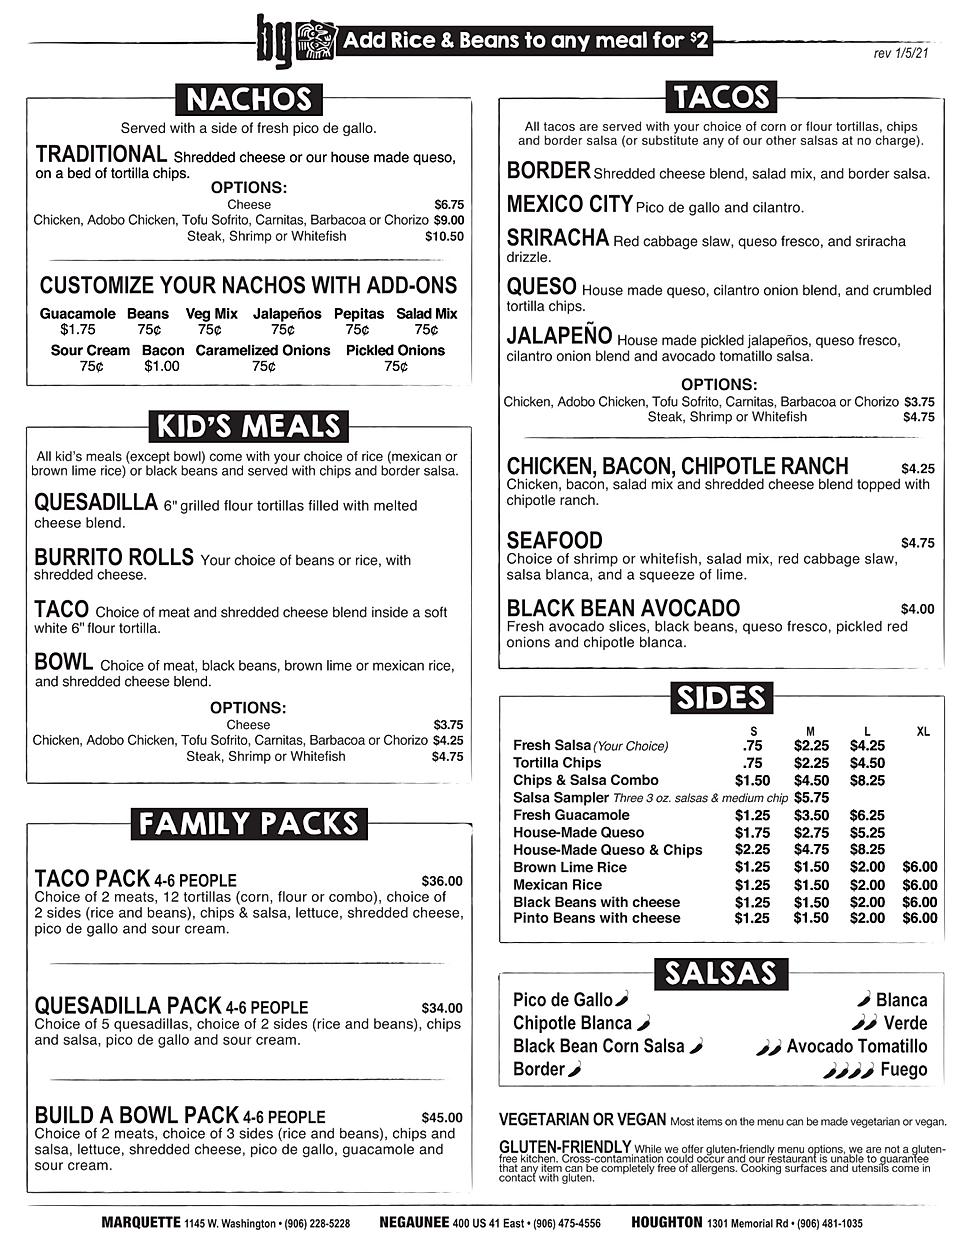 Border Grill restaurant menu happy hour hours location deals Marquette Now